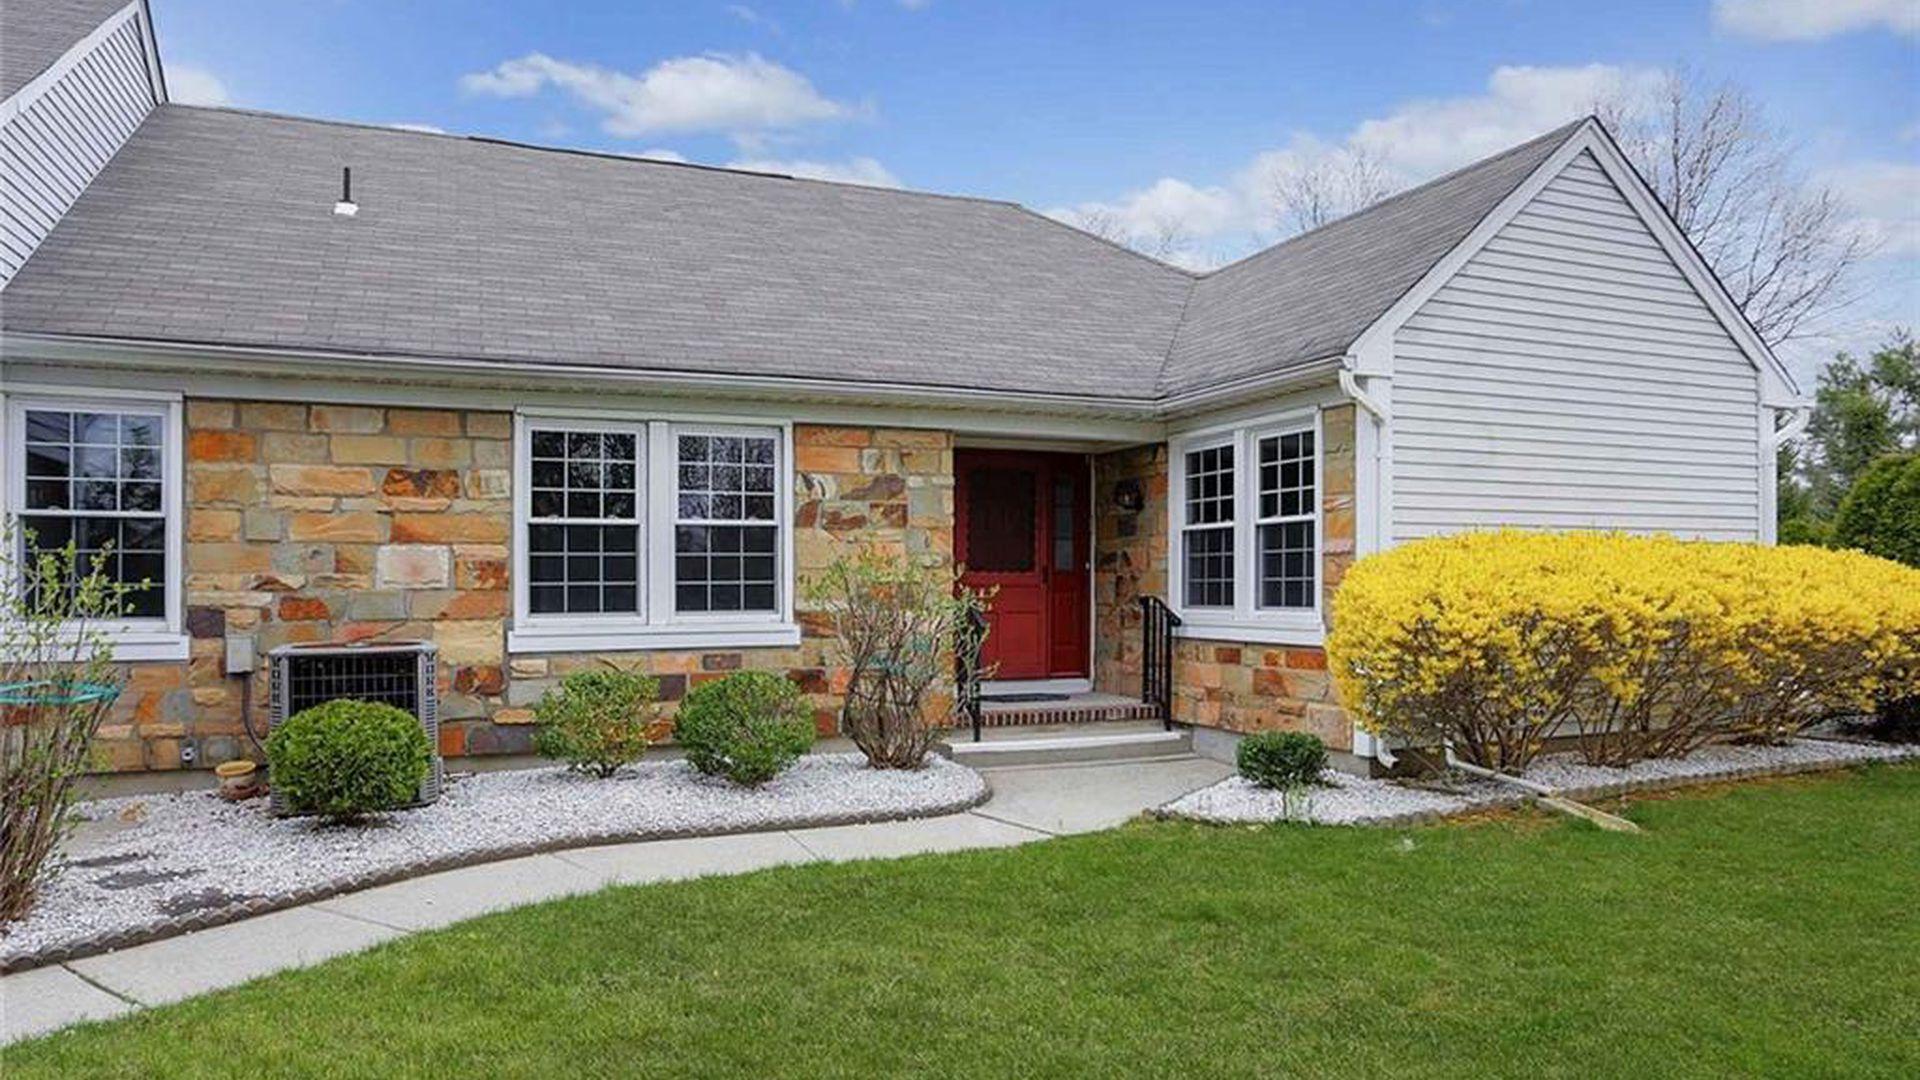 Brand new kitchen monroe nj real estate homes for sale